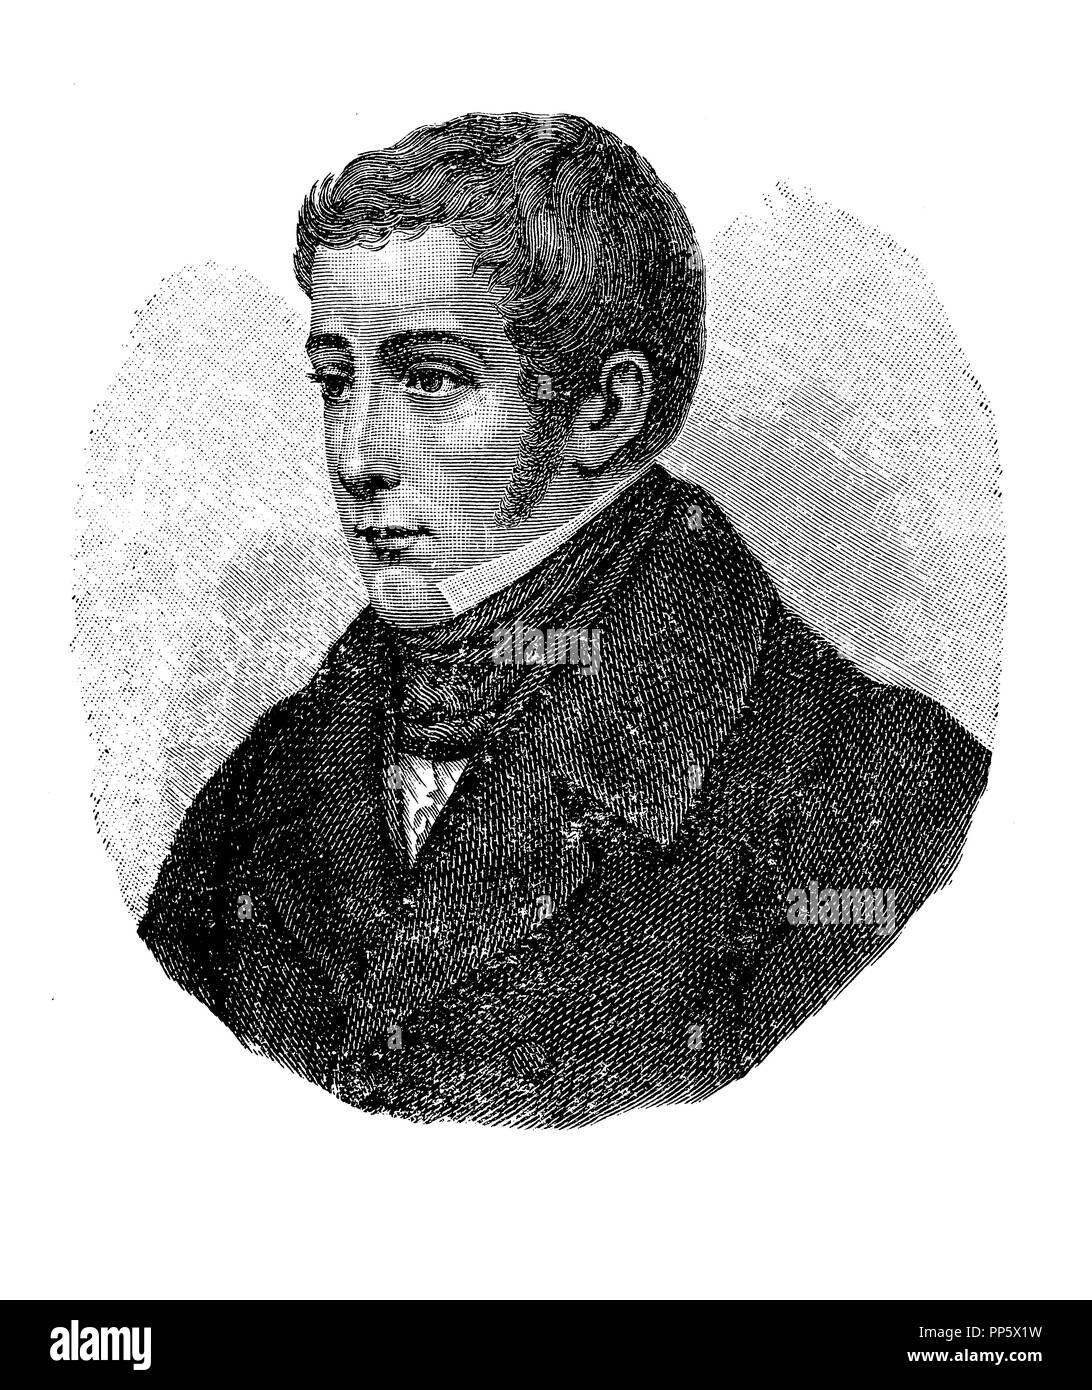 Engraving portrait of Giovanni Berchet (1783-1851), italian poet, patriot, influent in Italian Romanticism. - Stock Image